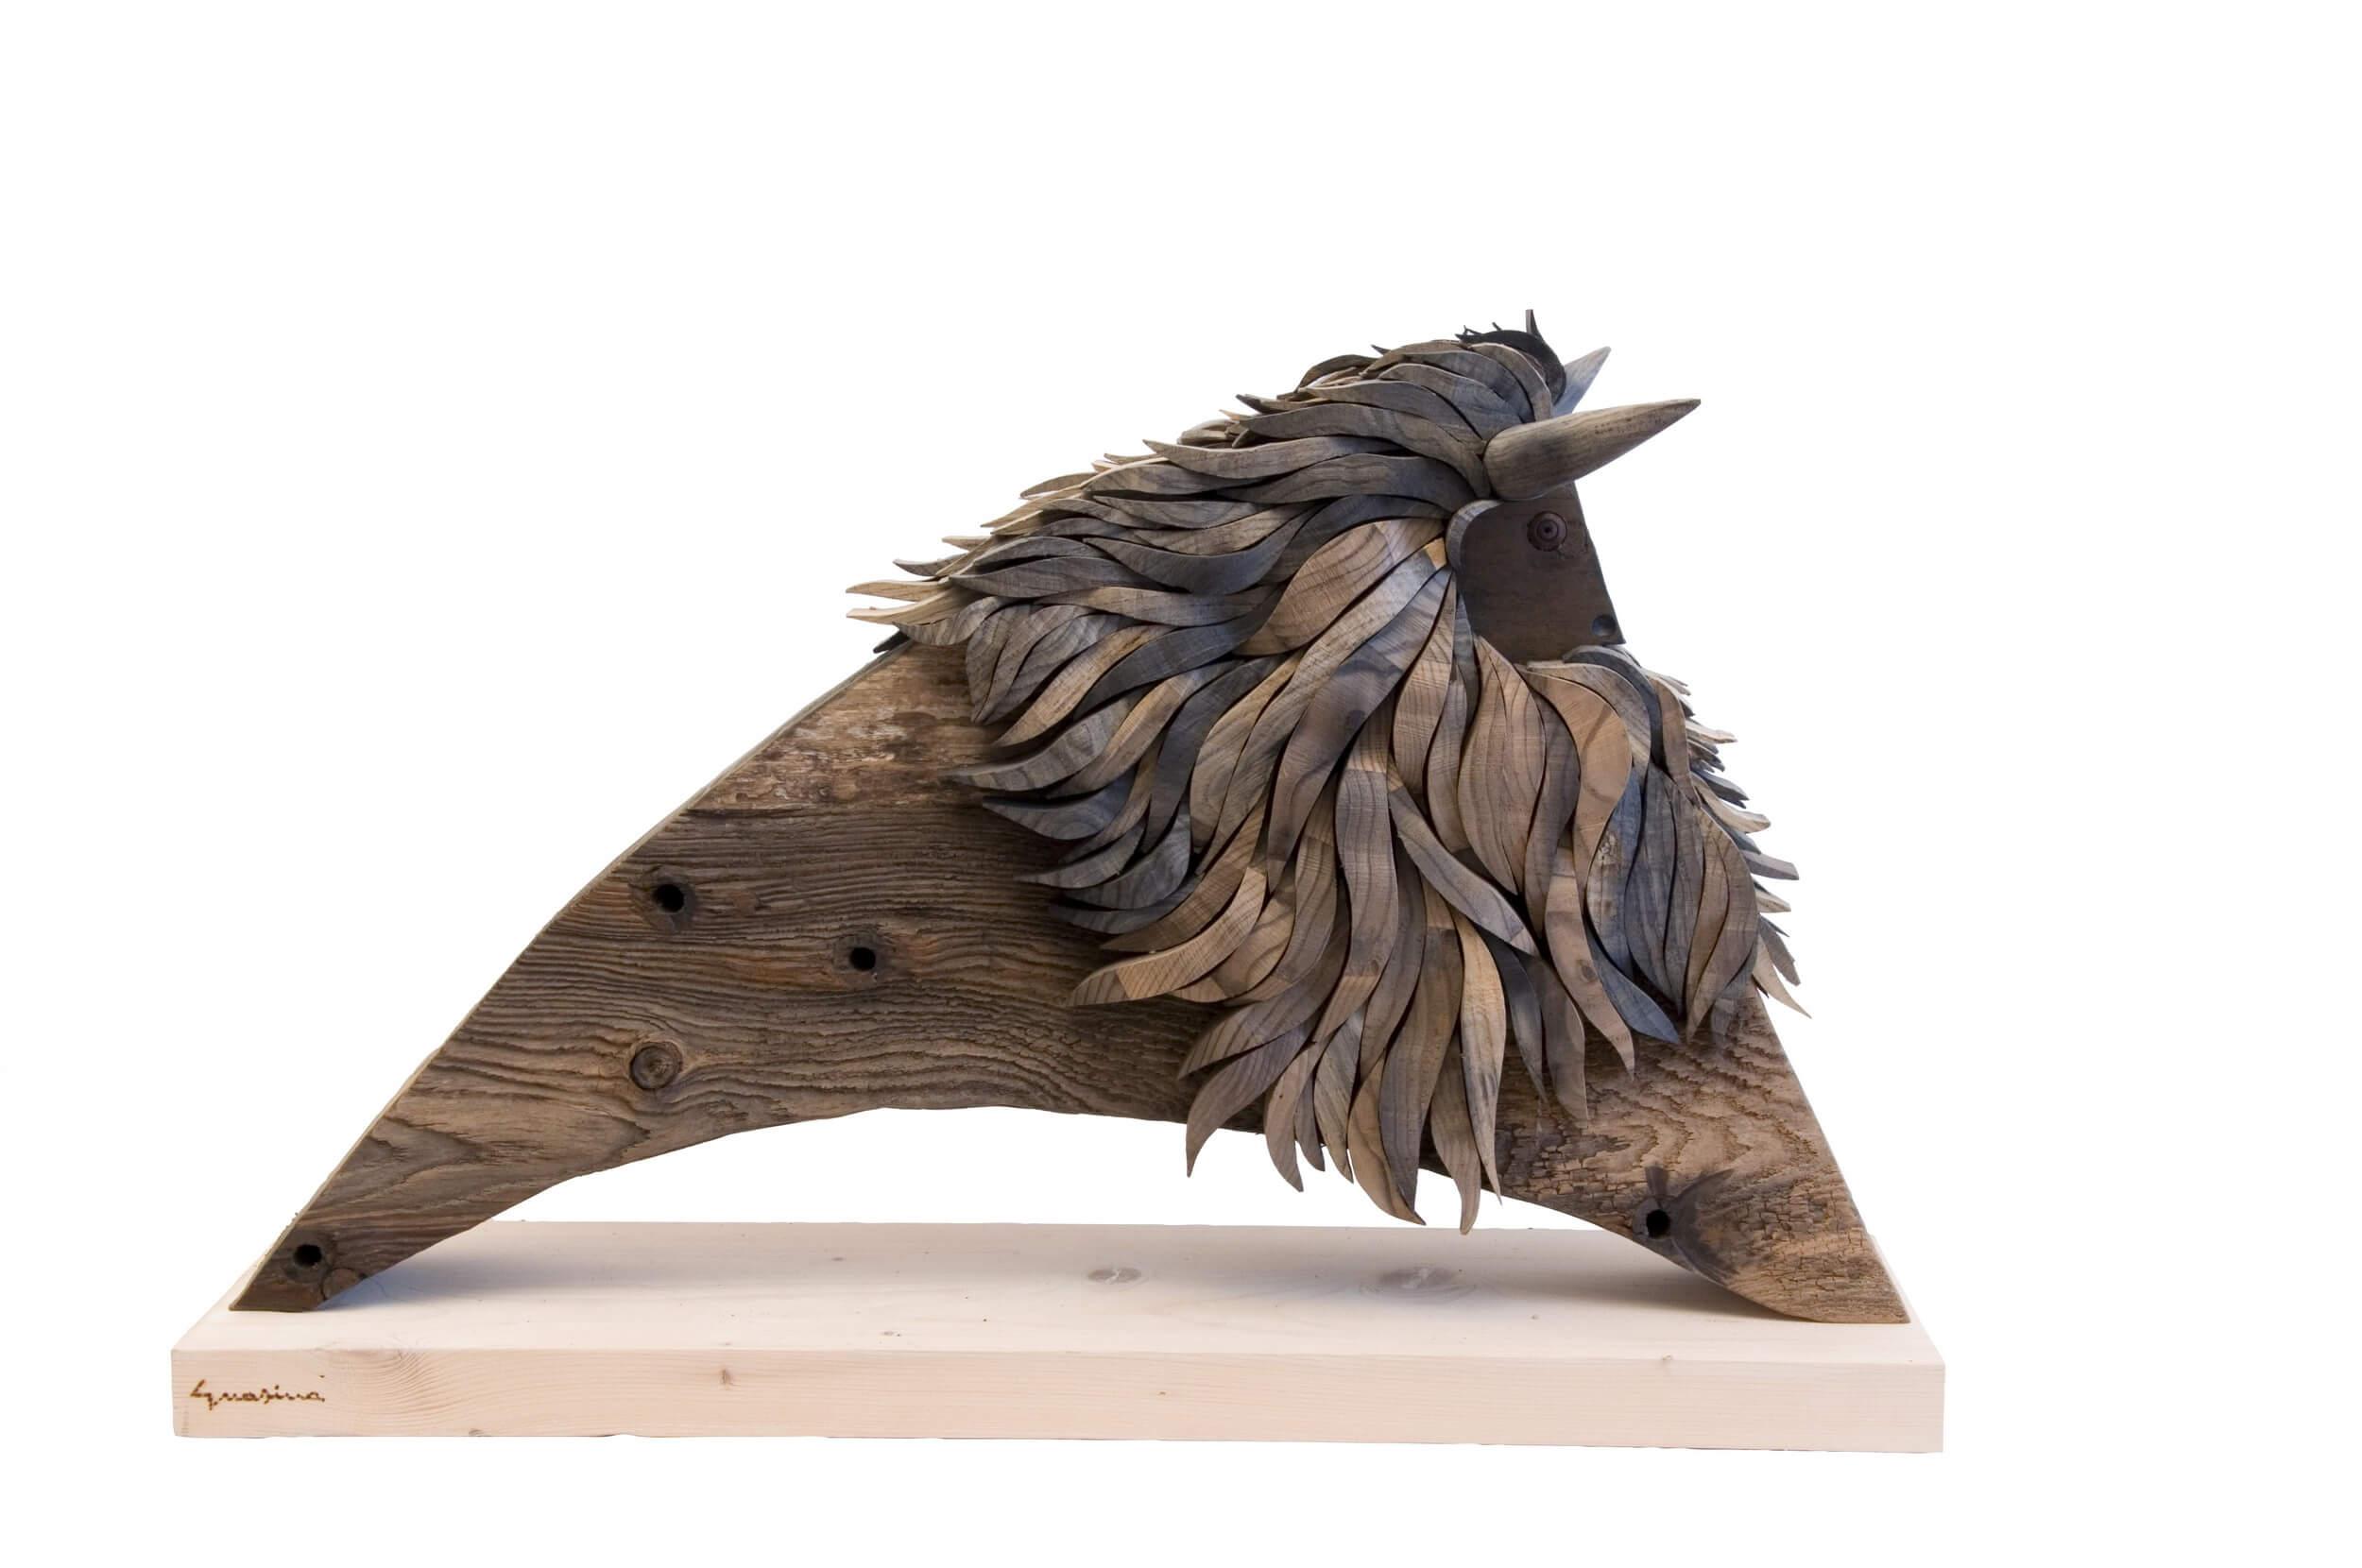 Creazioni in legno: Figure